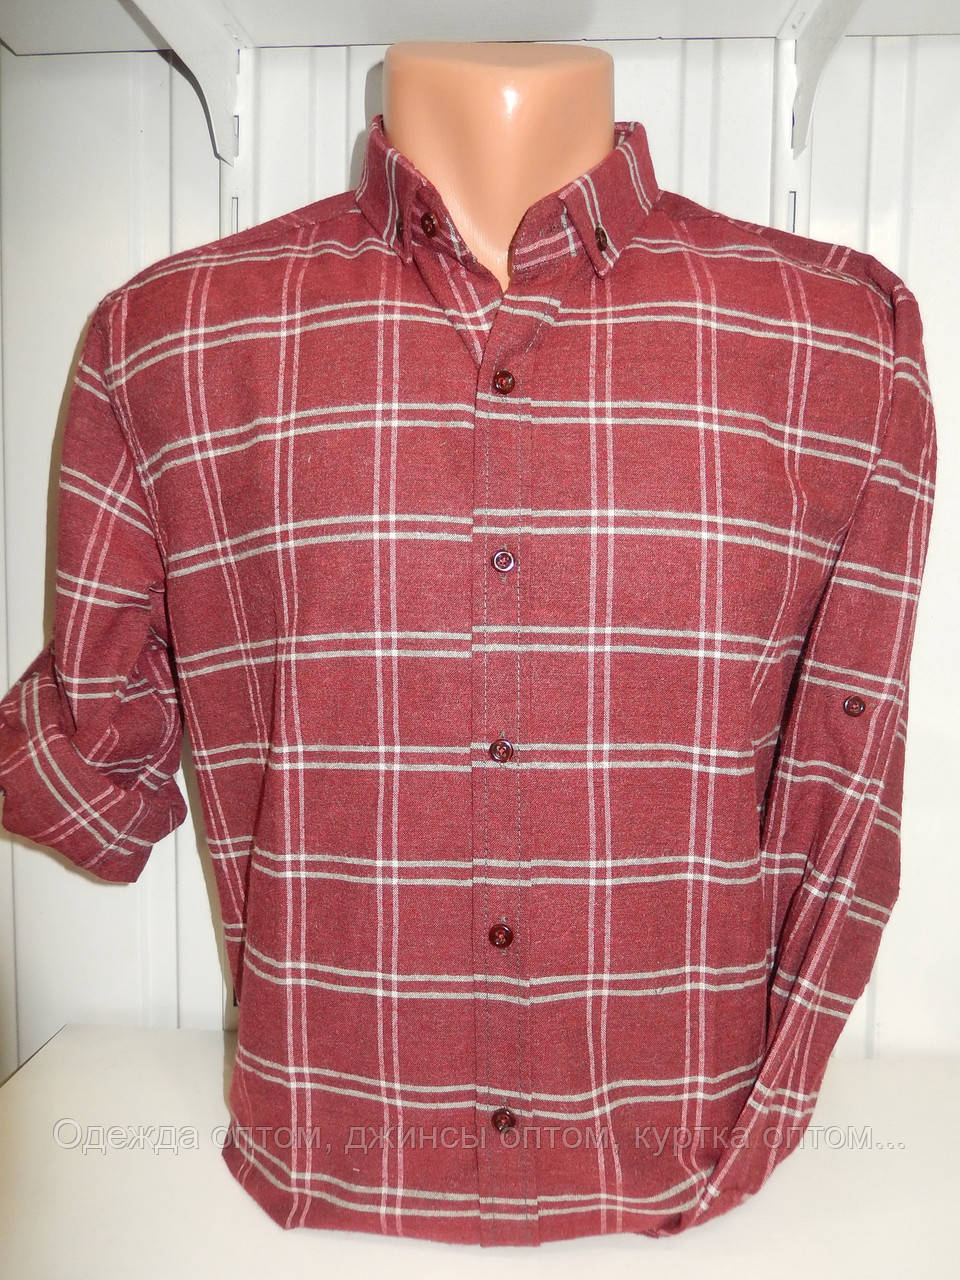 519788f32fc0436 Рубашка мужская теплая оптом. Рубашка клетка - Одежда оптом, джинсы оптом,  куртка оптом